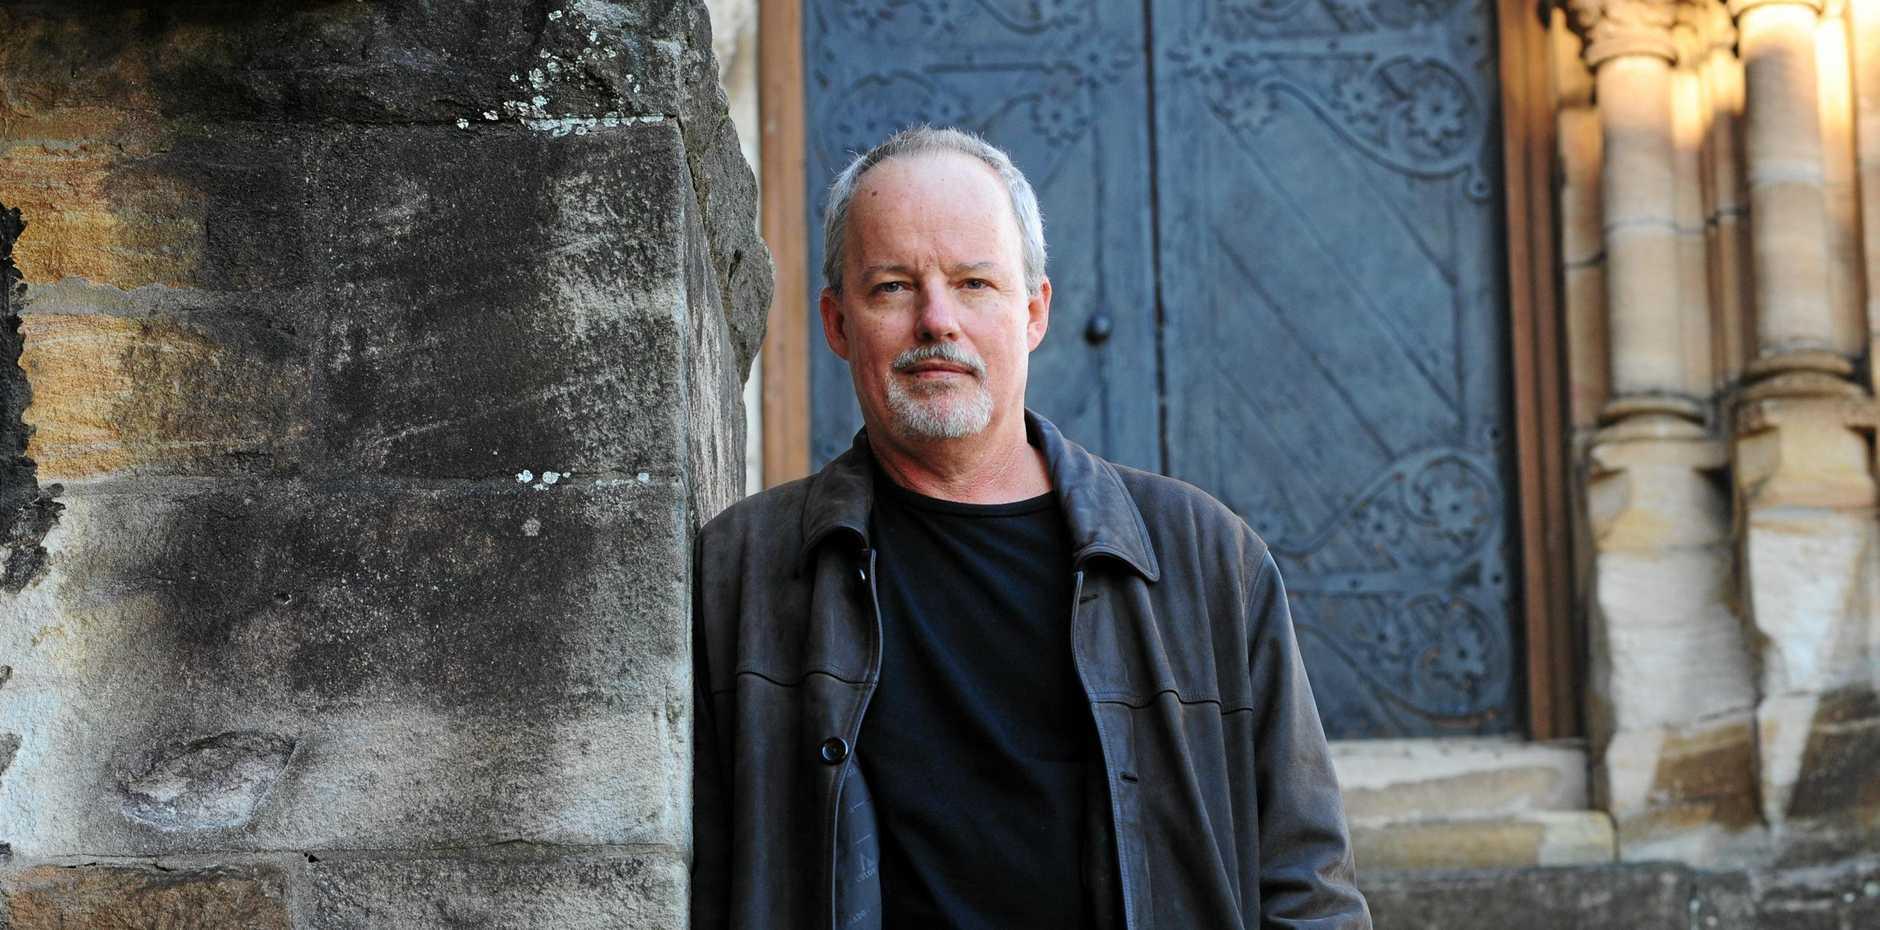 GUEST SPEAKER: Crime writer Michael Robotham will visit Casino on July 31.